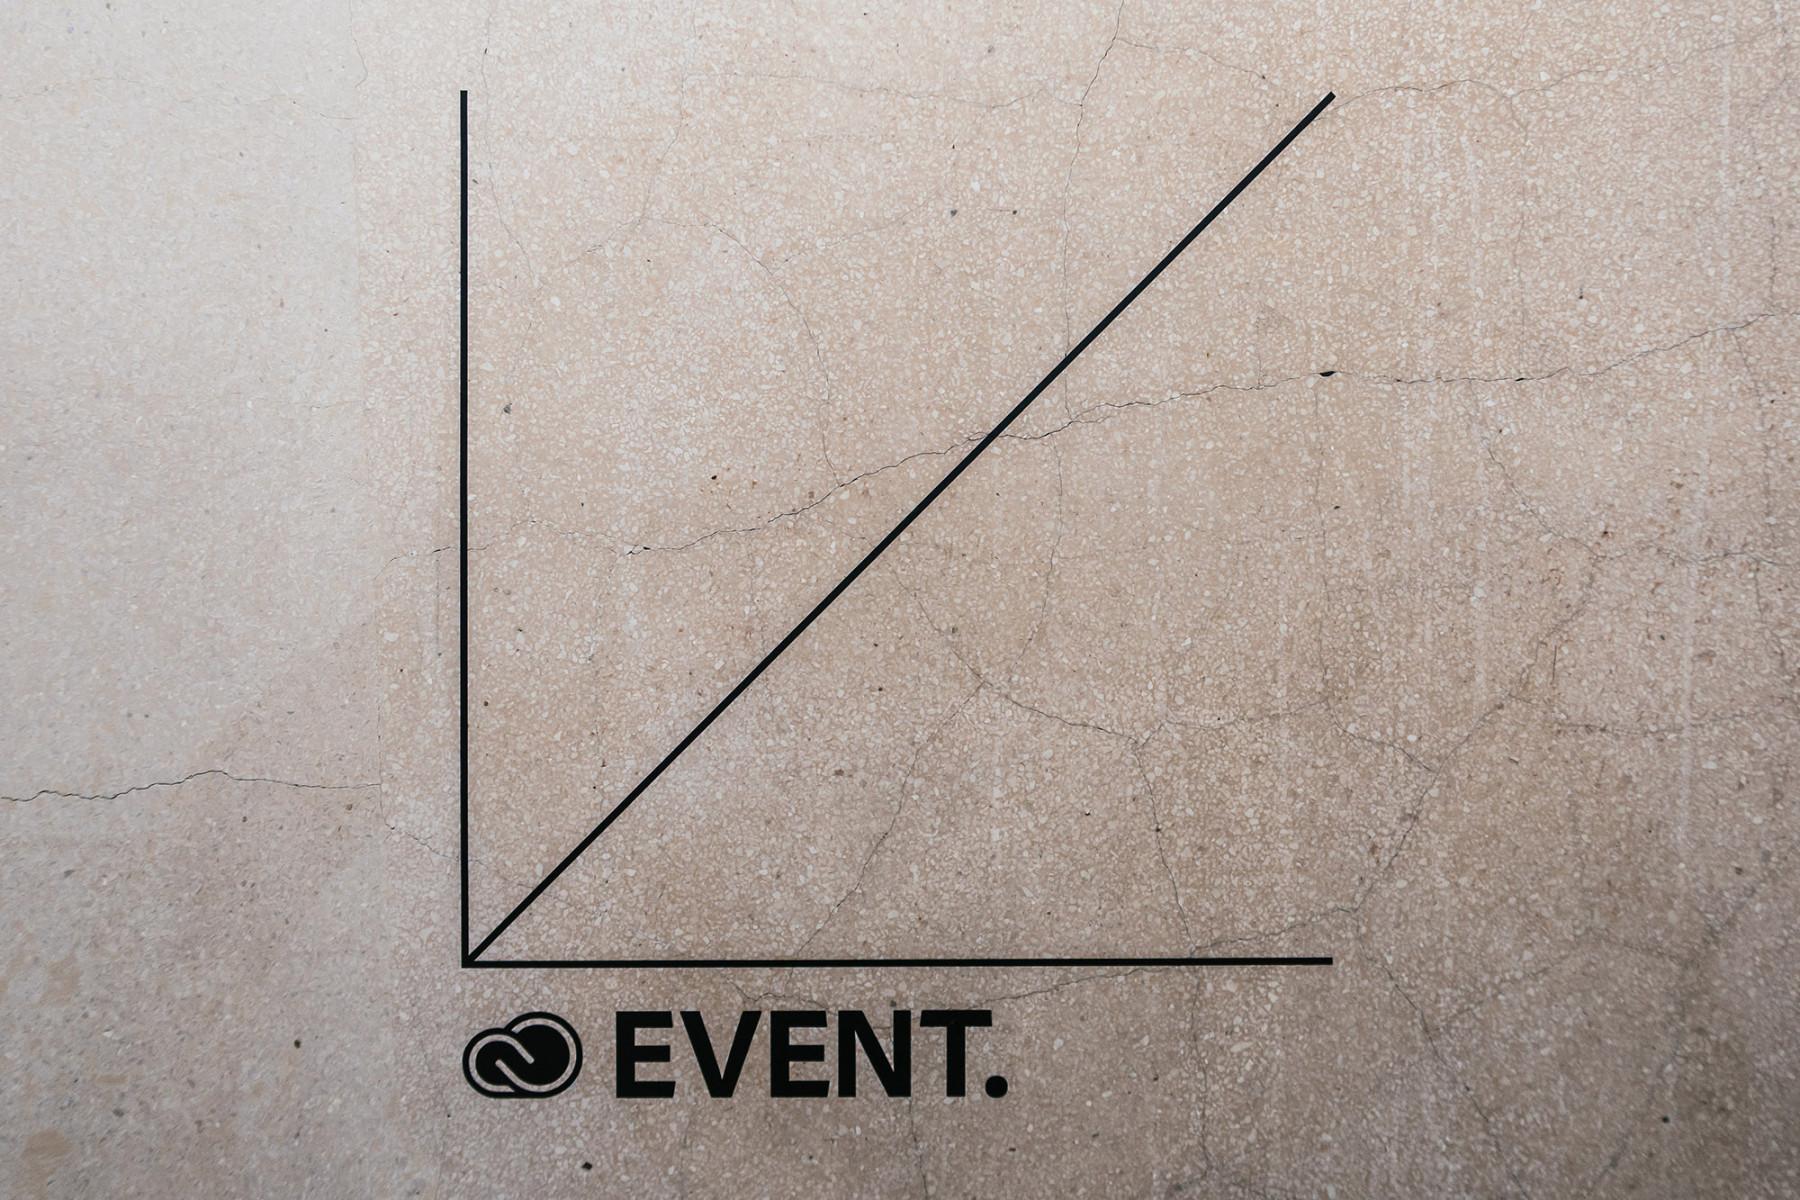 Adobe Creative Cloud Event Signage